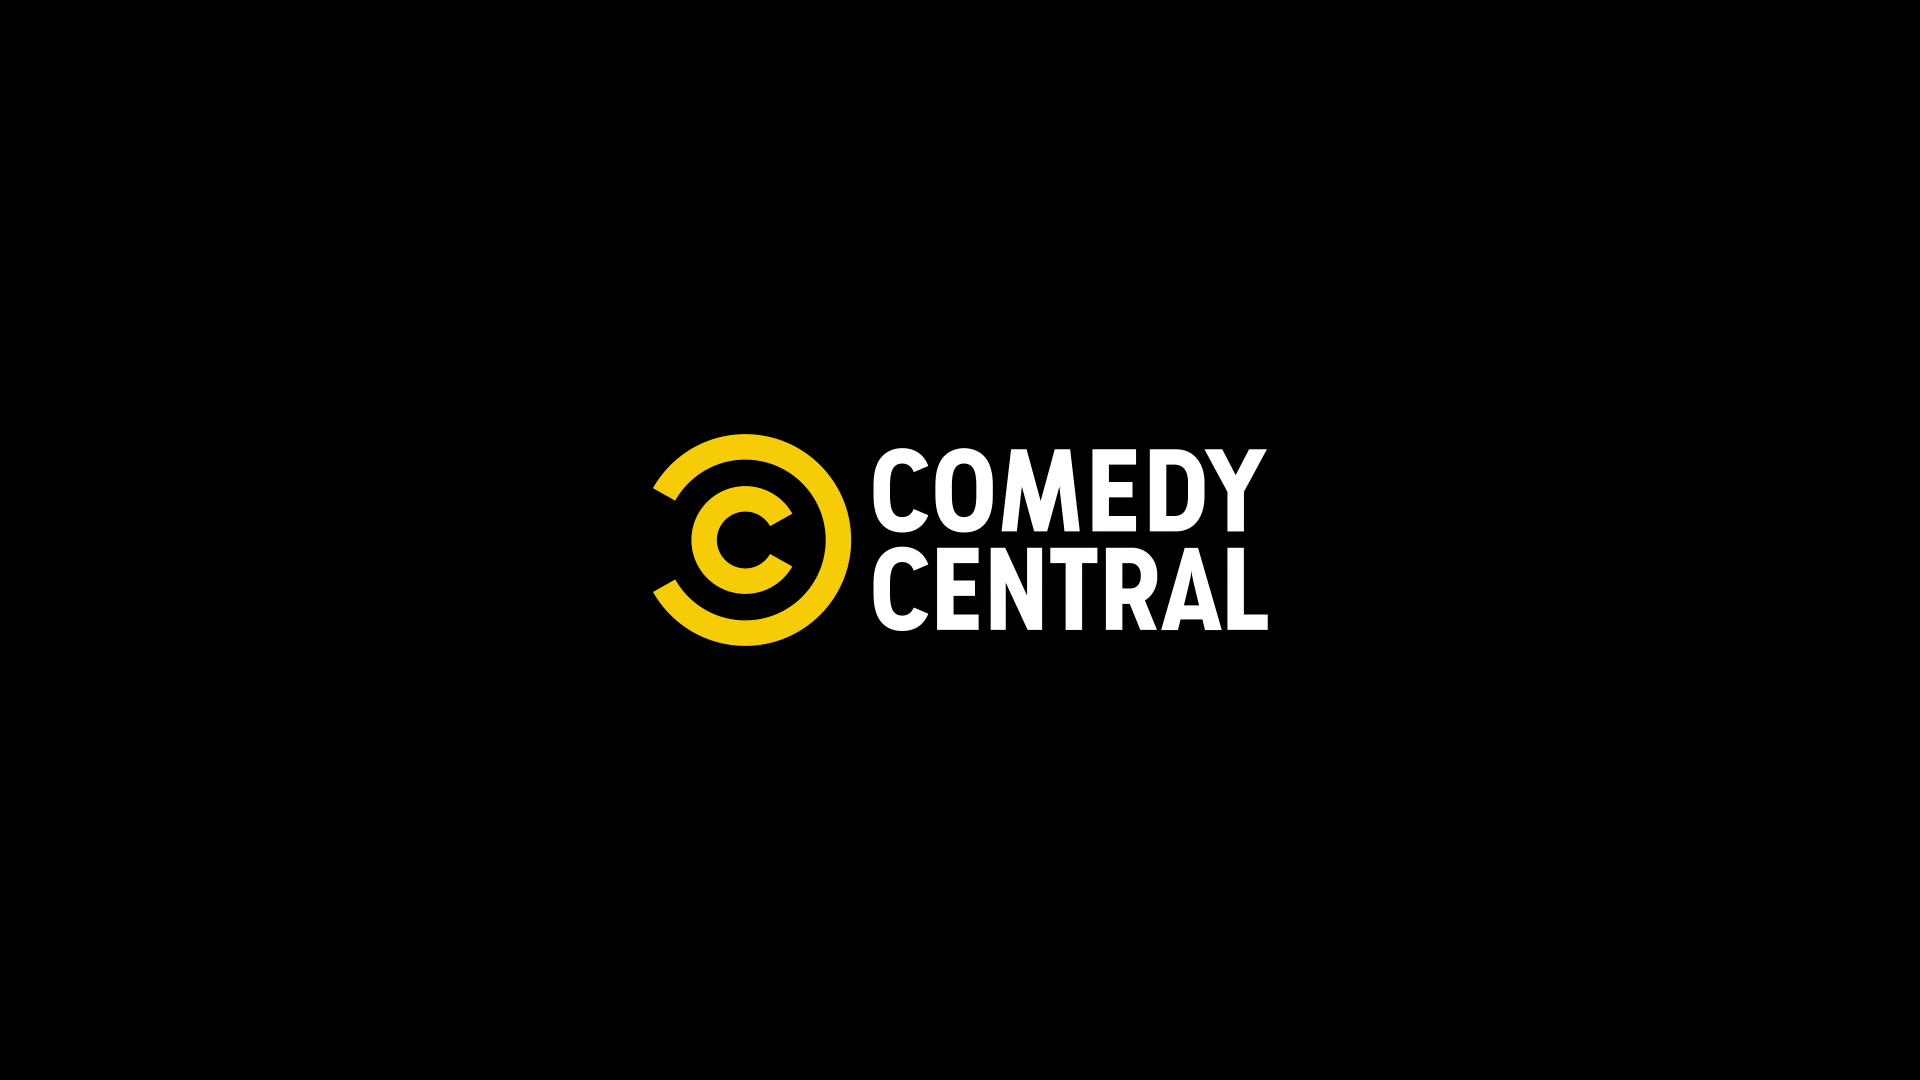 Pin By Leo On Corporate Design Corporate Design Company Logo Comedy Central